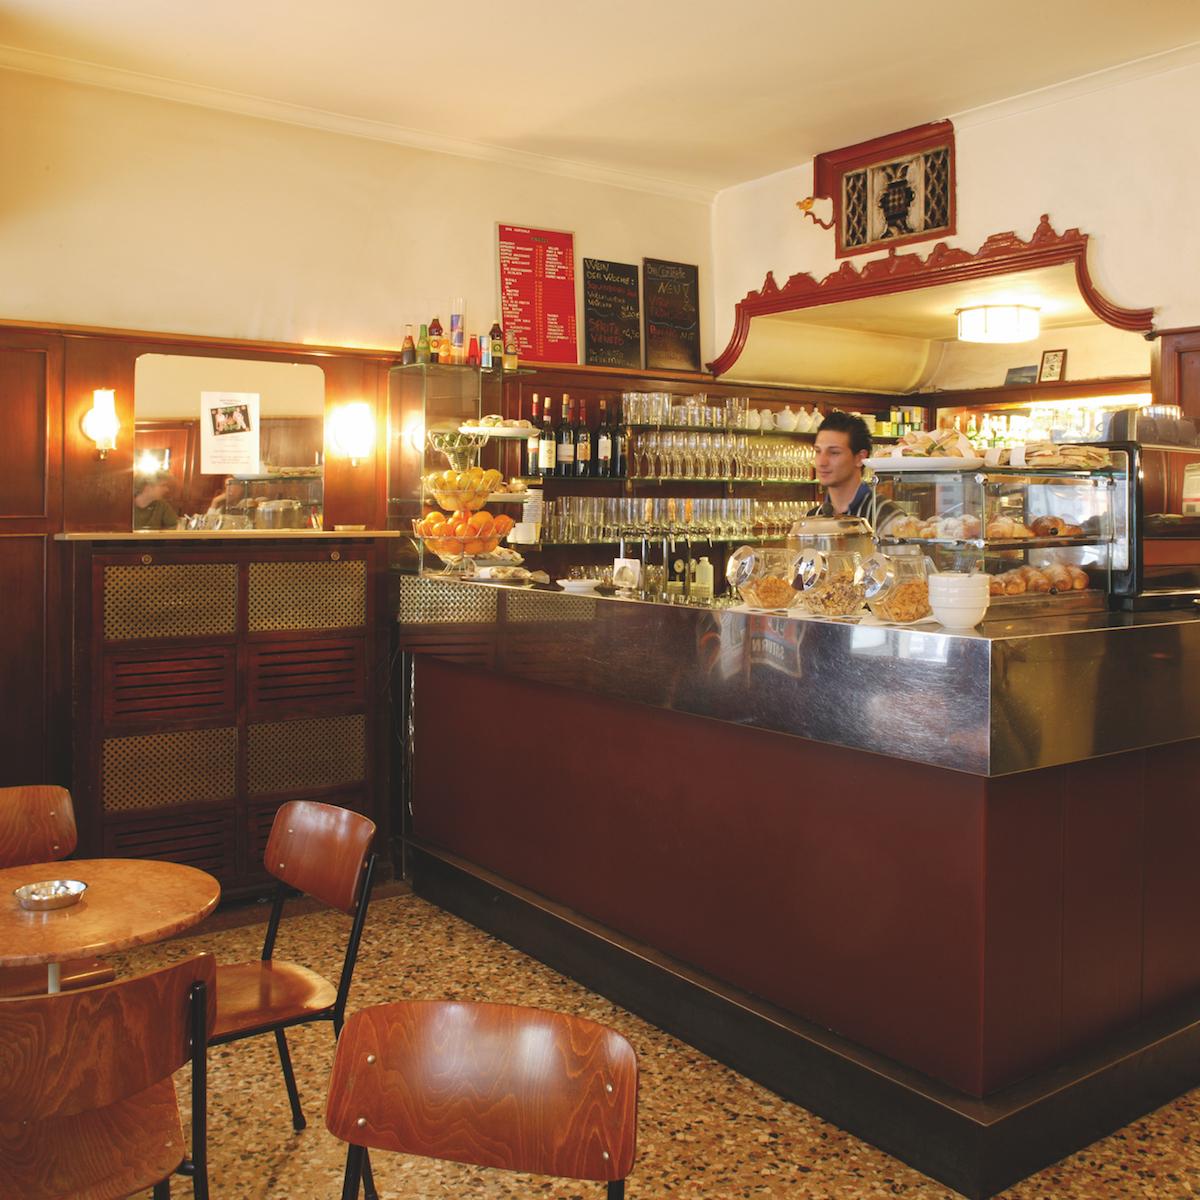 Location Bar Centrale Café in München